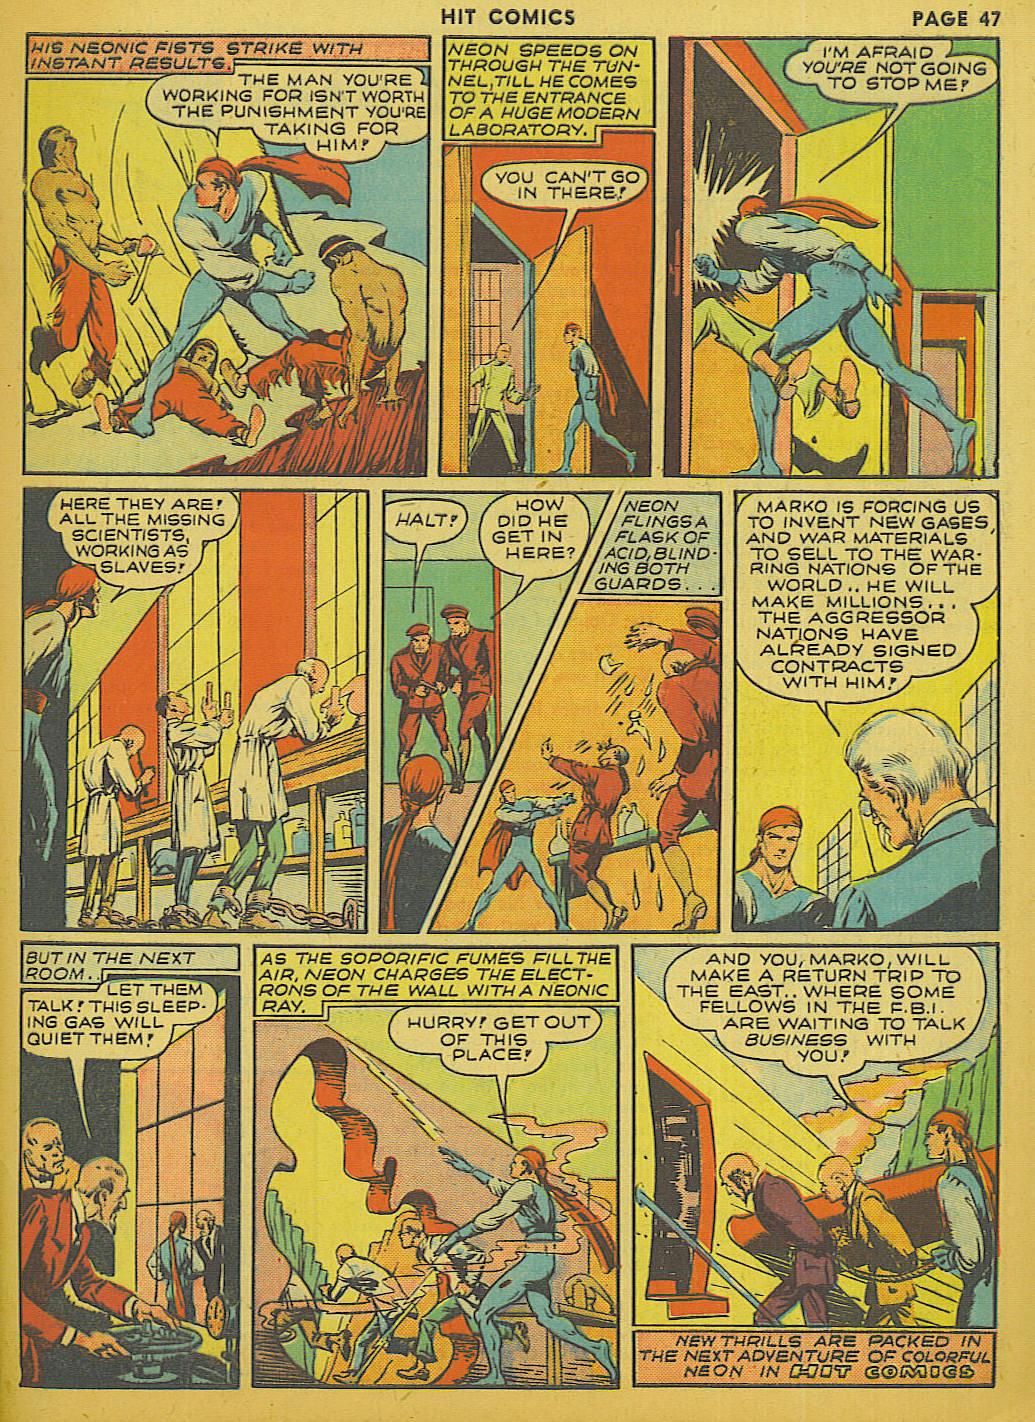 Read online Hit Comics comic -  Issue #13 - 49